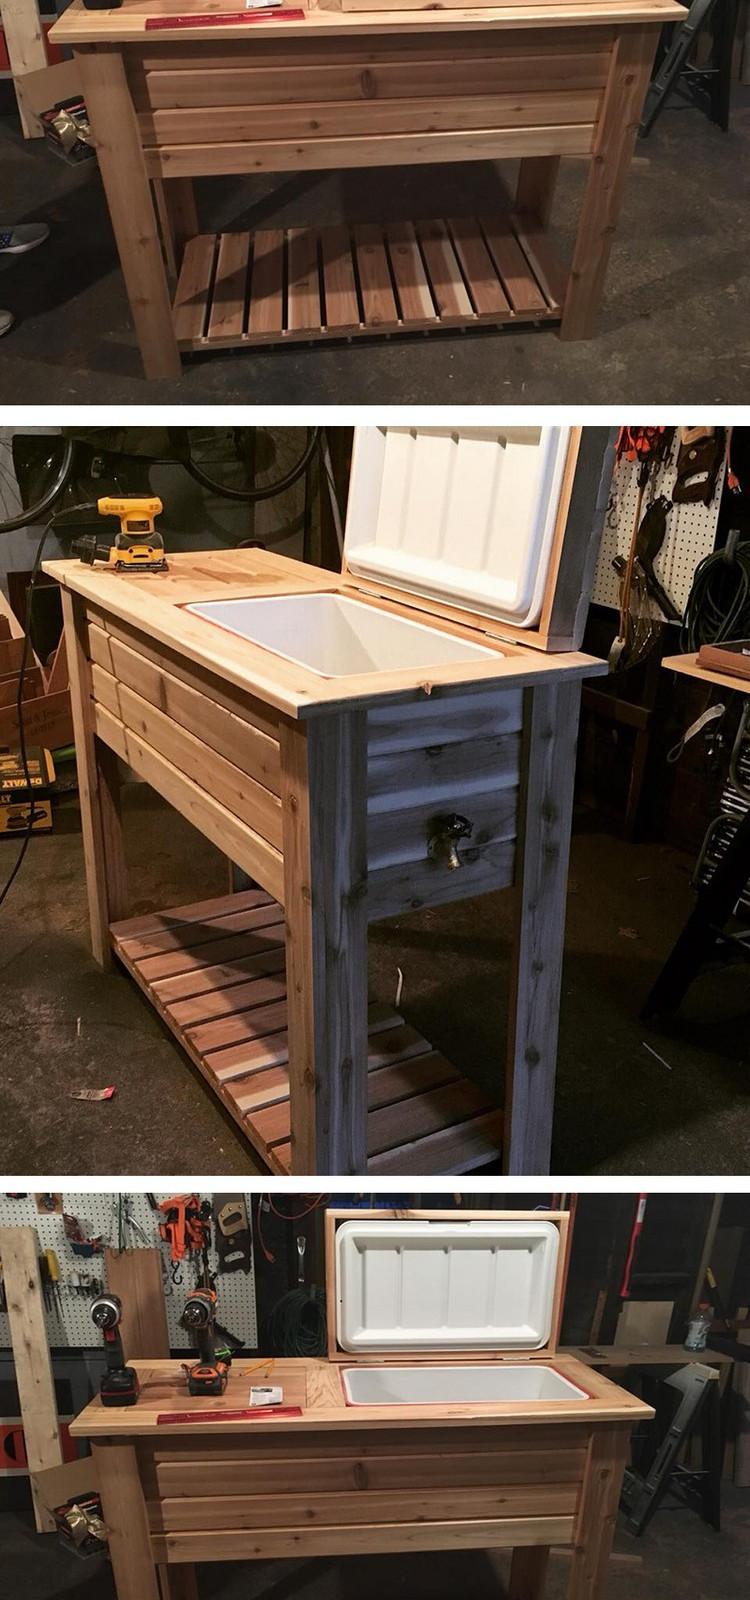 Low Cost DIY Wood Pallet Creations Ideas - Sensod